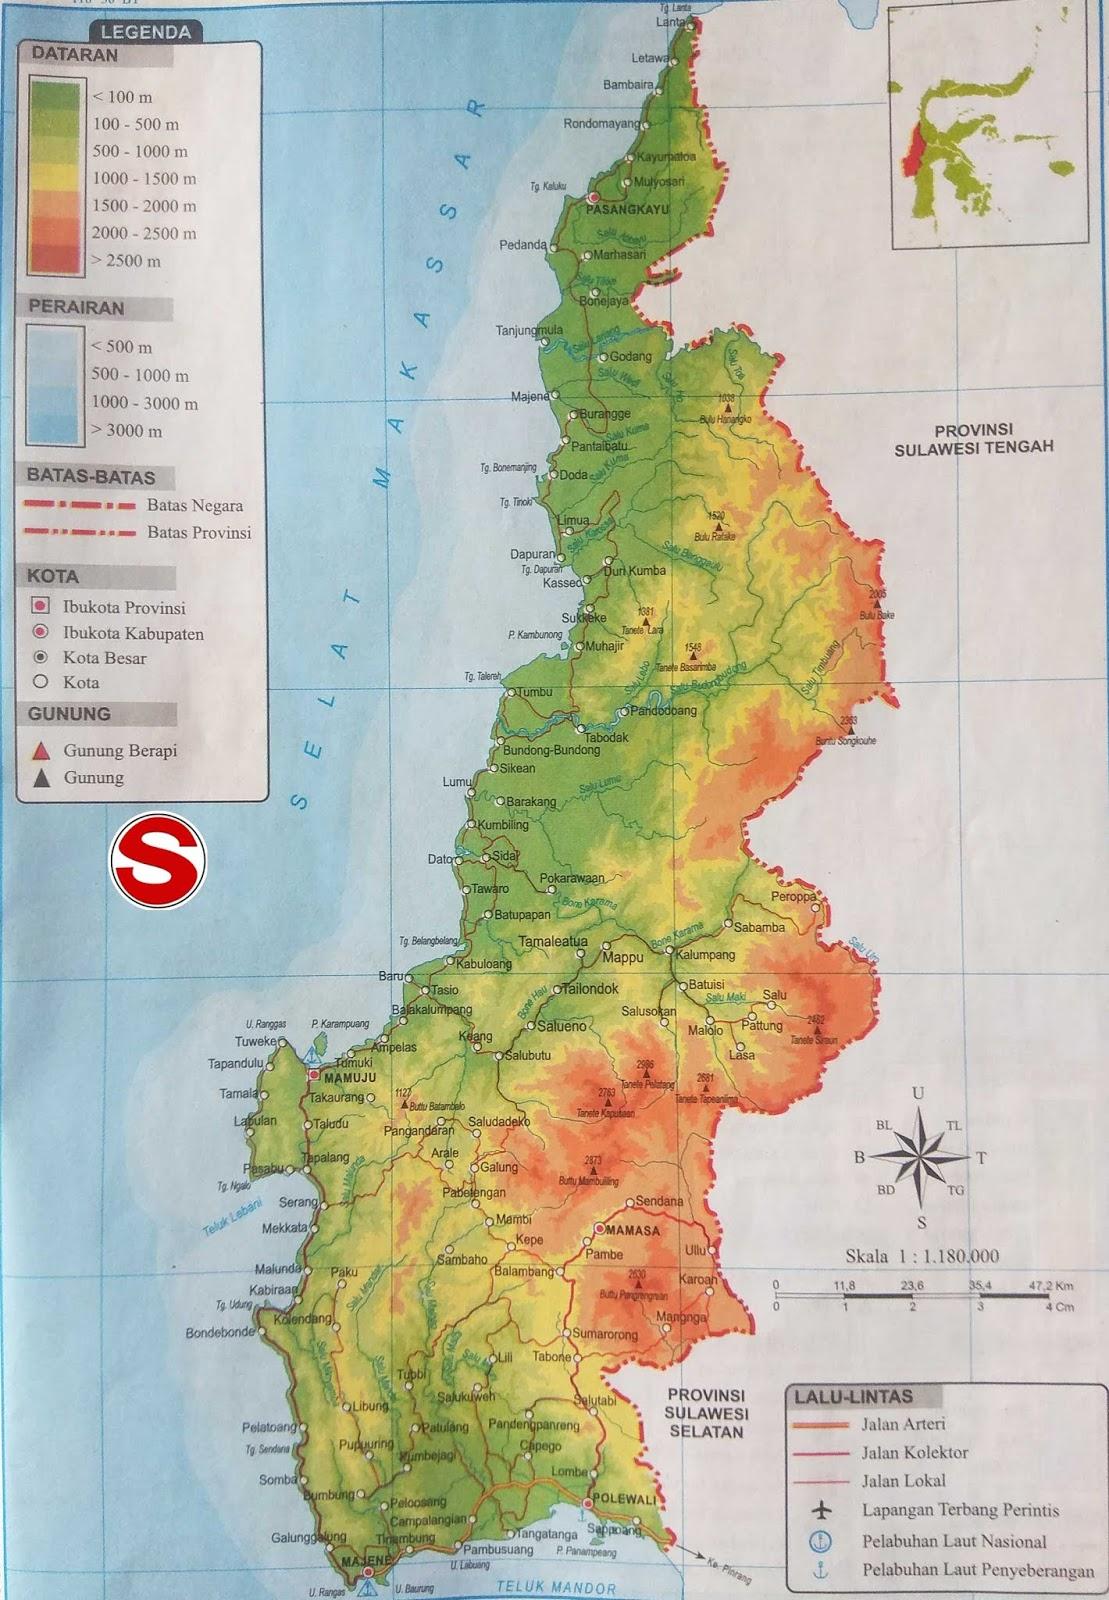 Peta Atlas Provinsi Sulawesi Barat di bawah ini mencakup peta dataran Peta Atlas Provinsi Sulawesi Barat